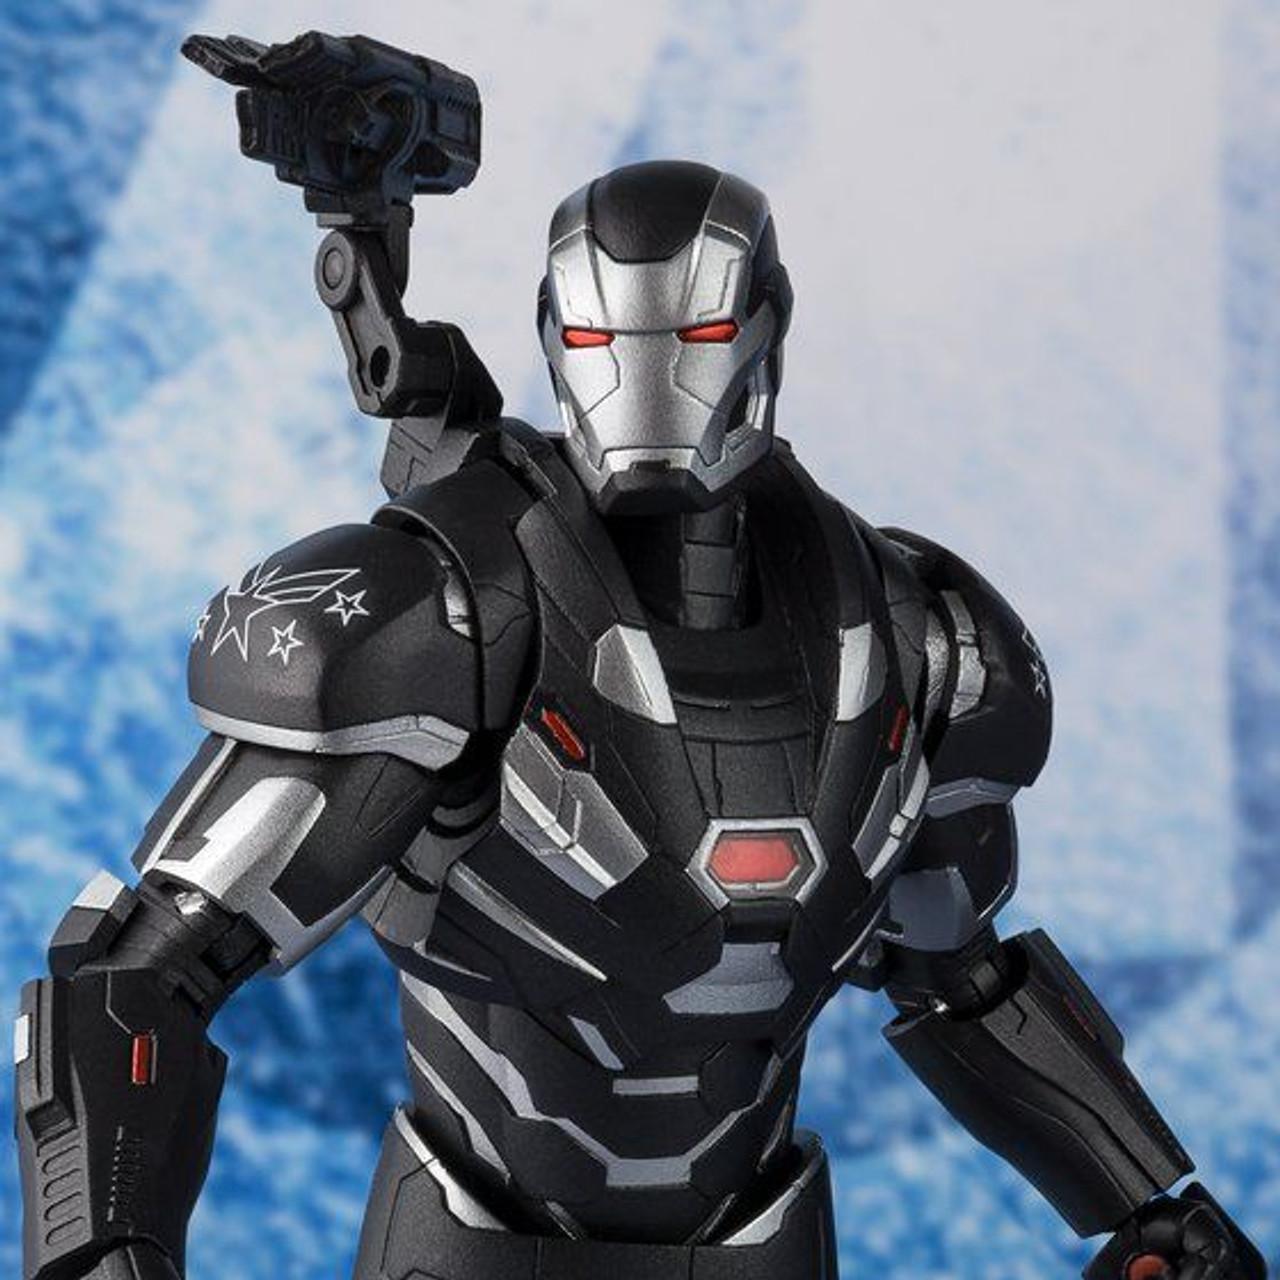 Avengers 4 Endgame Armor Thanos Captain America War Machine Action Figure Toys